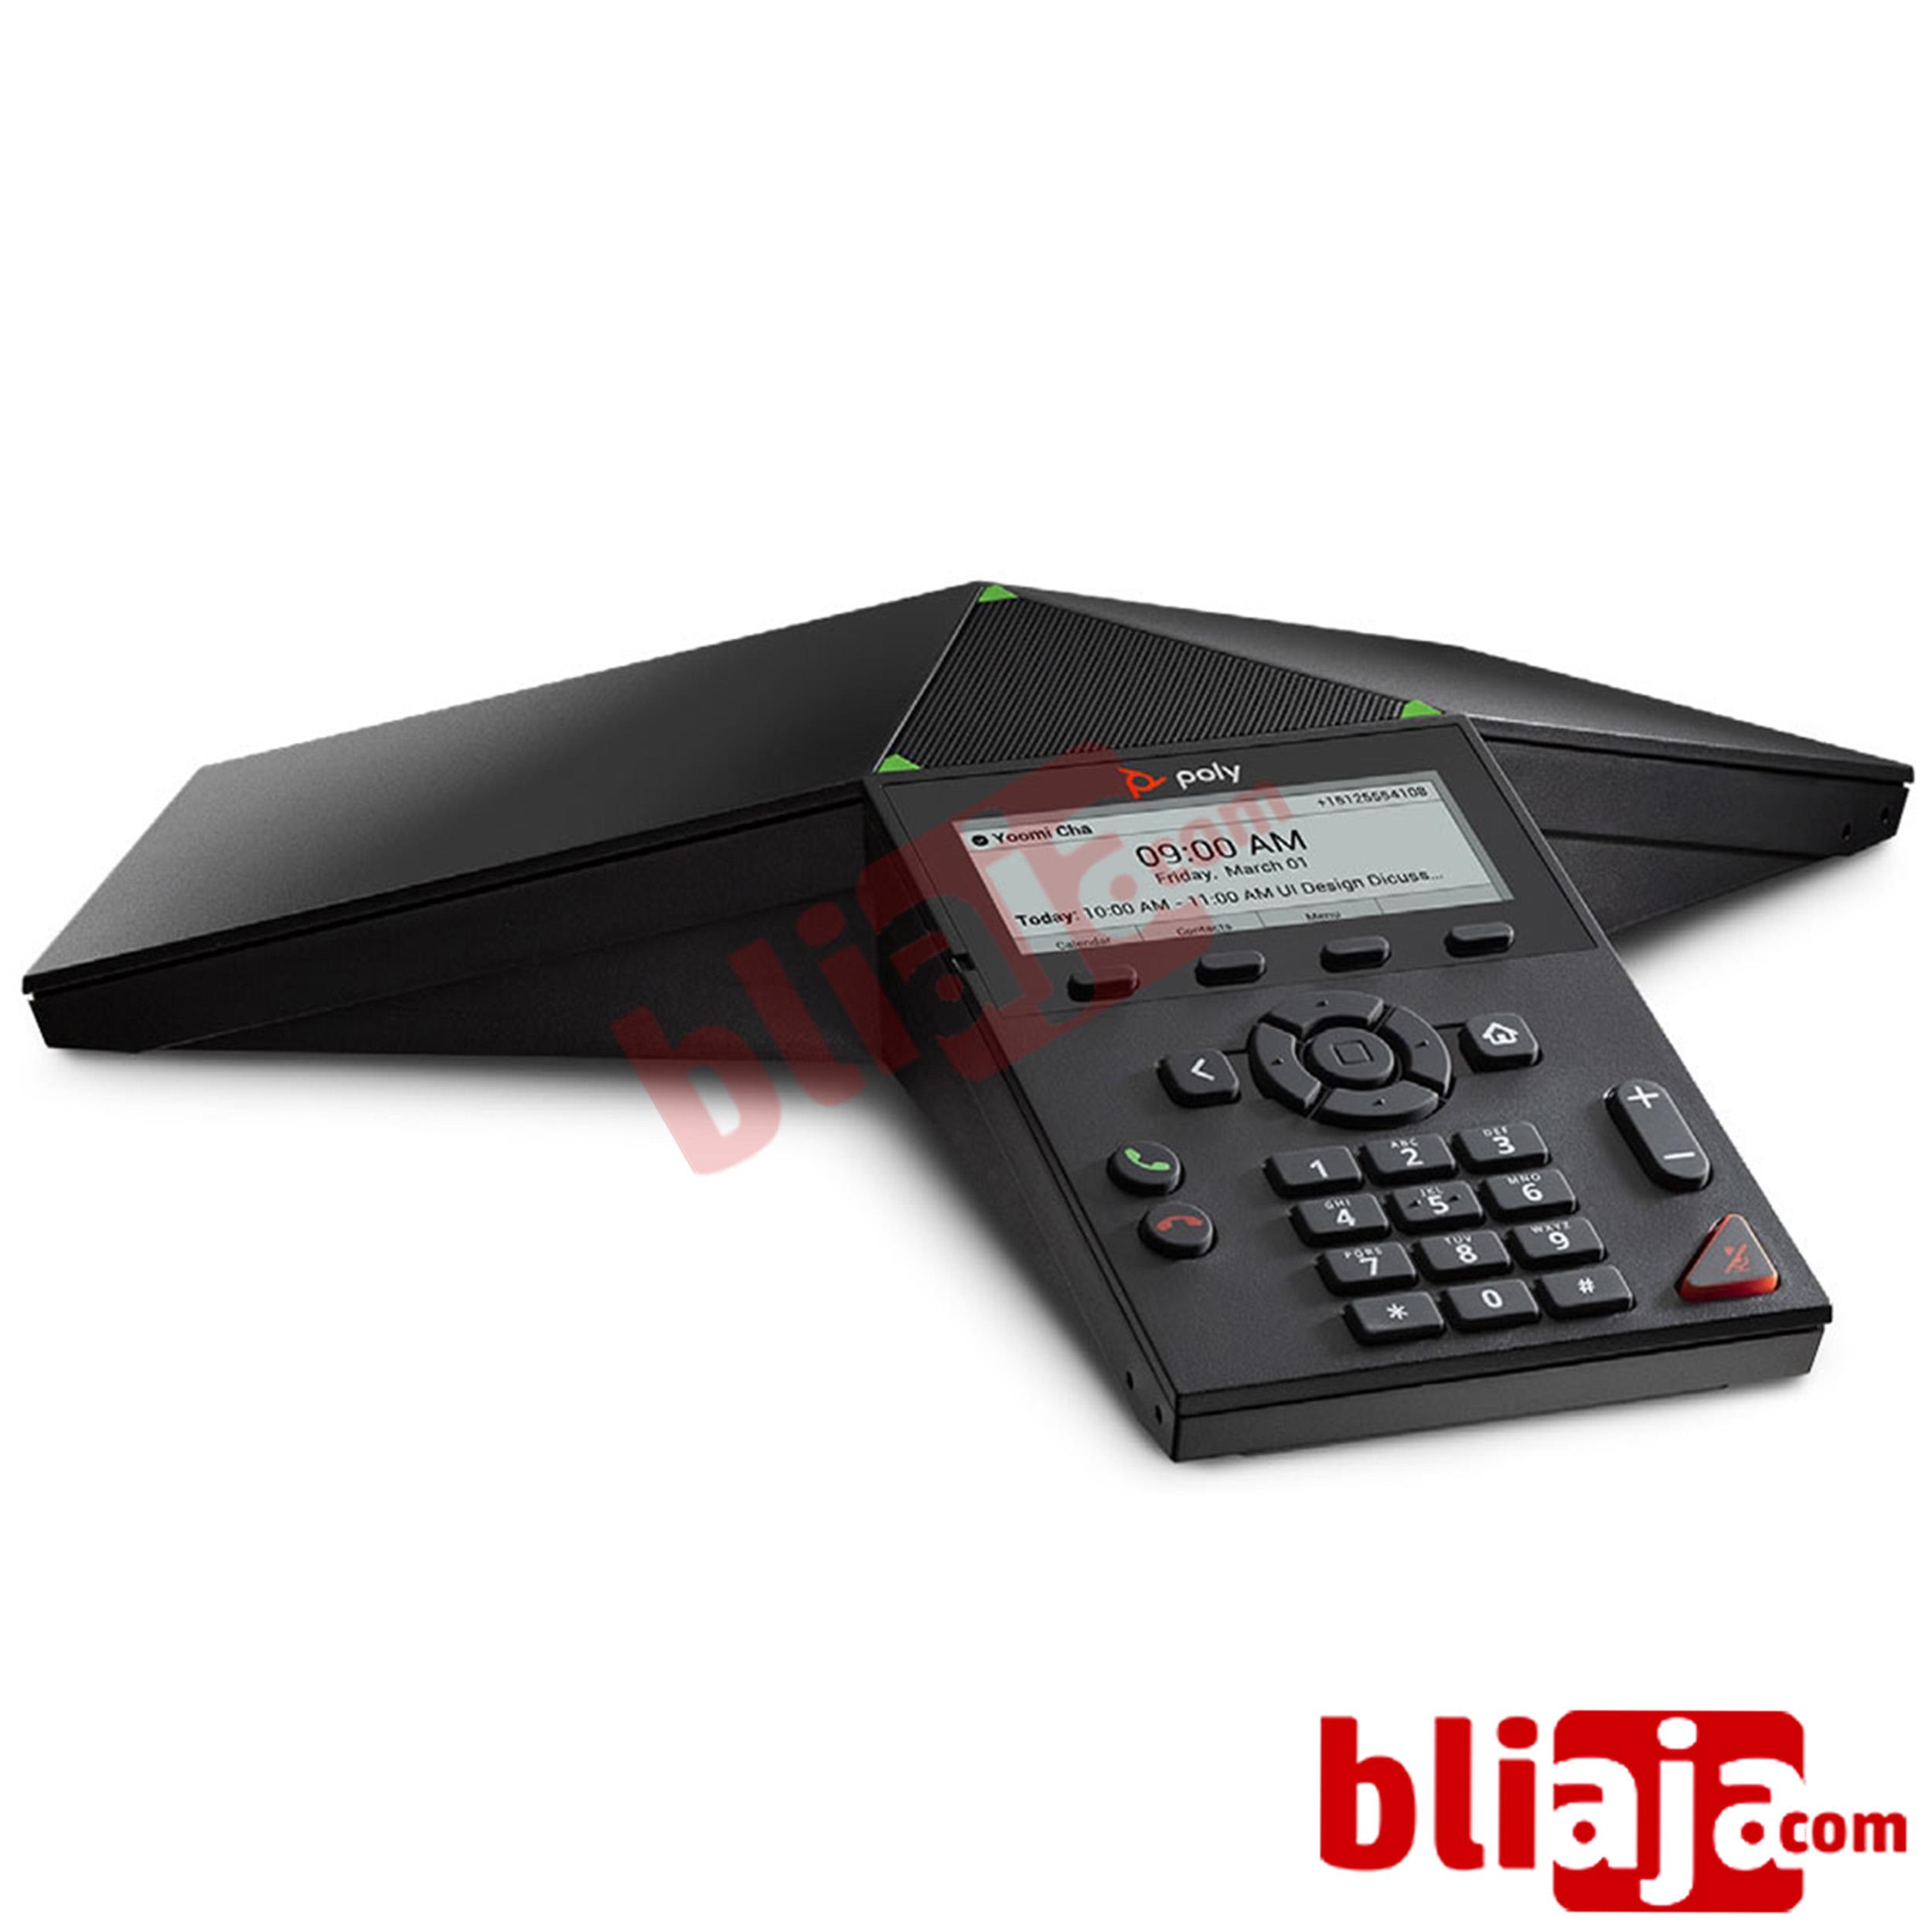 Polycom Trio 8300 IP Conference phone 4870-66800-160